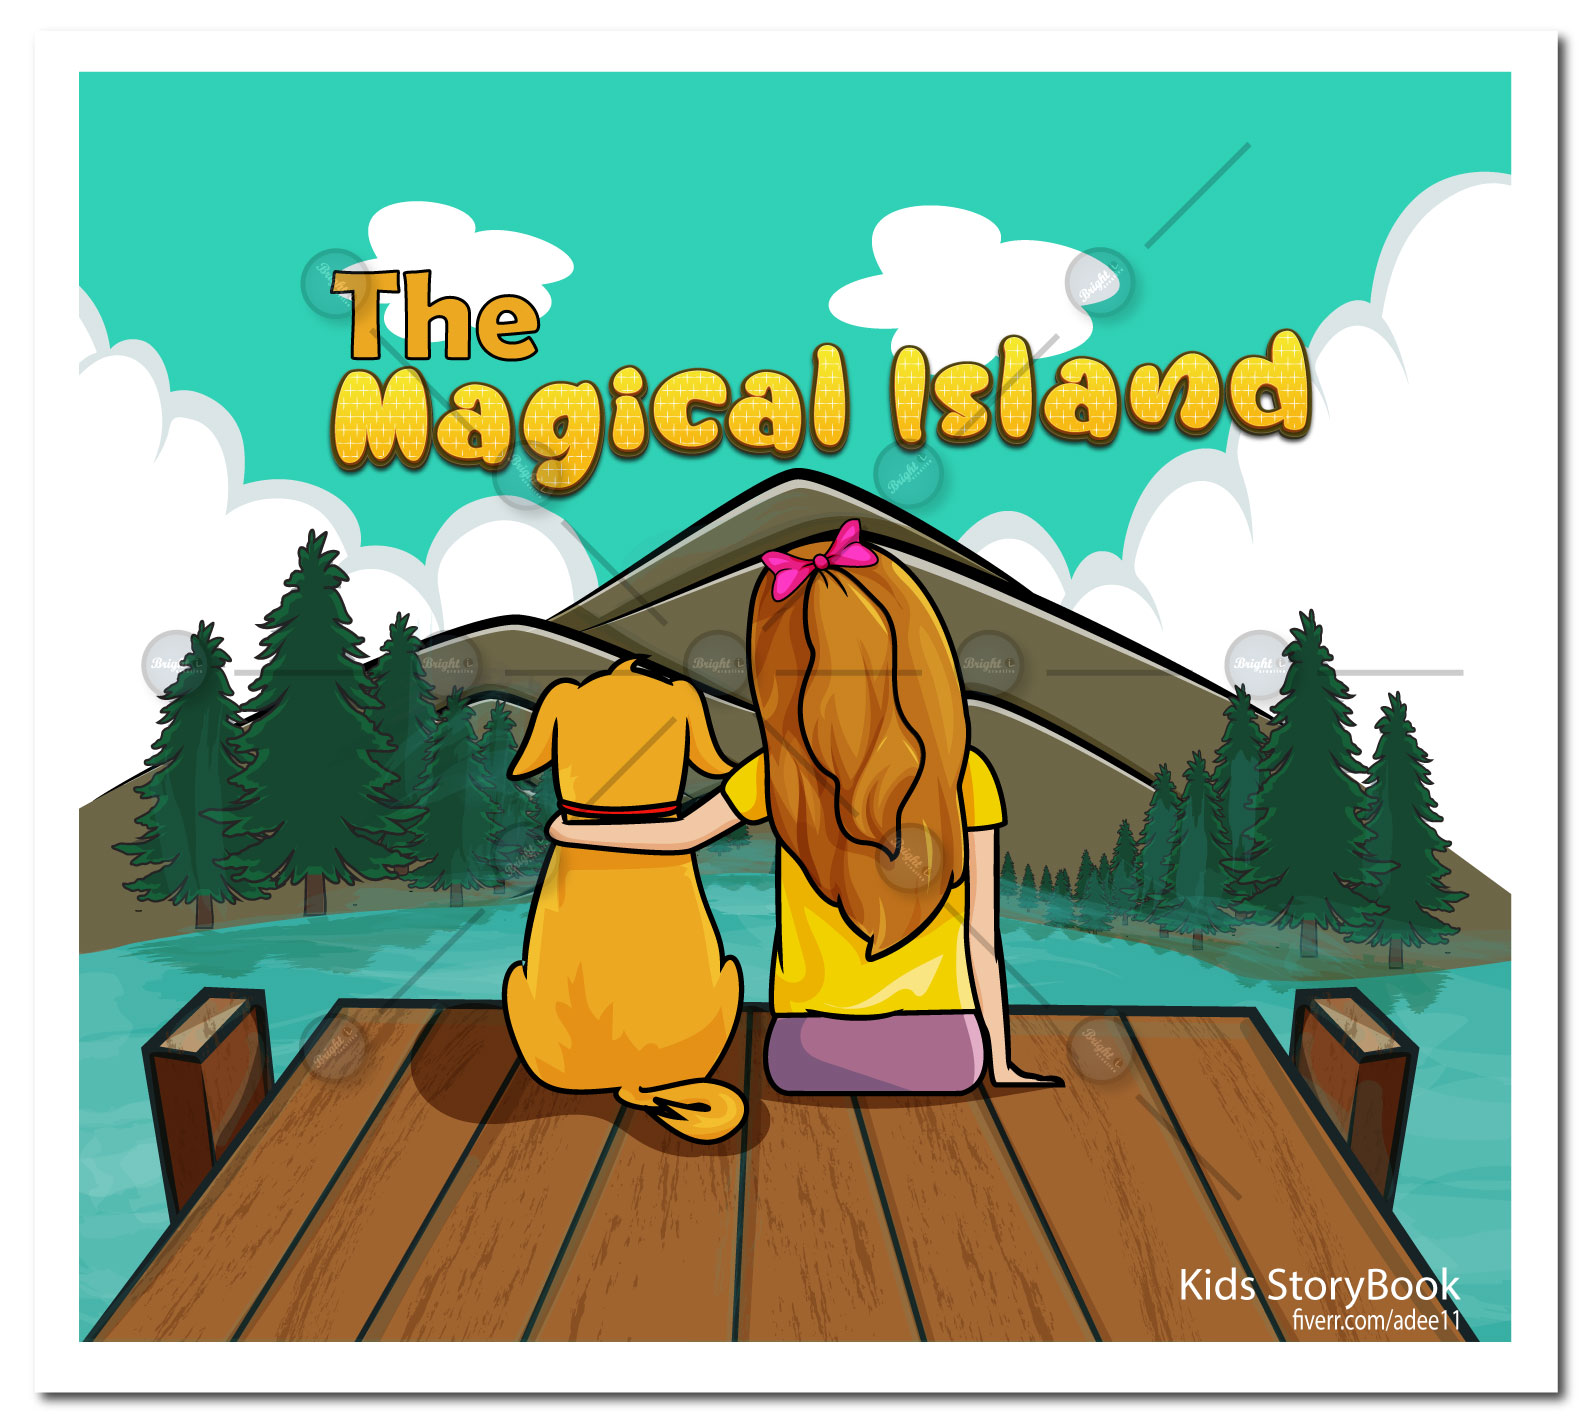 I will illustrate kids storybook pages, children storybook illustration